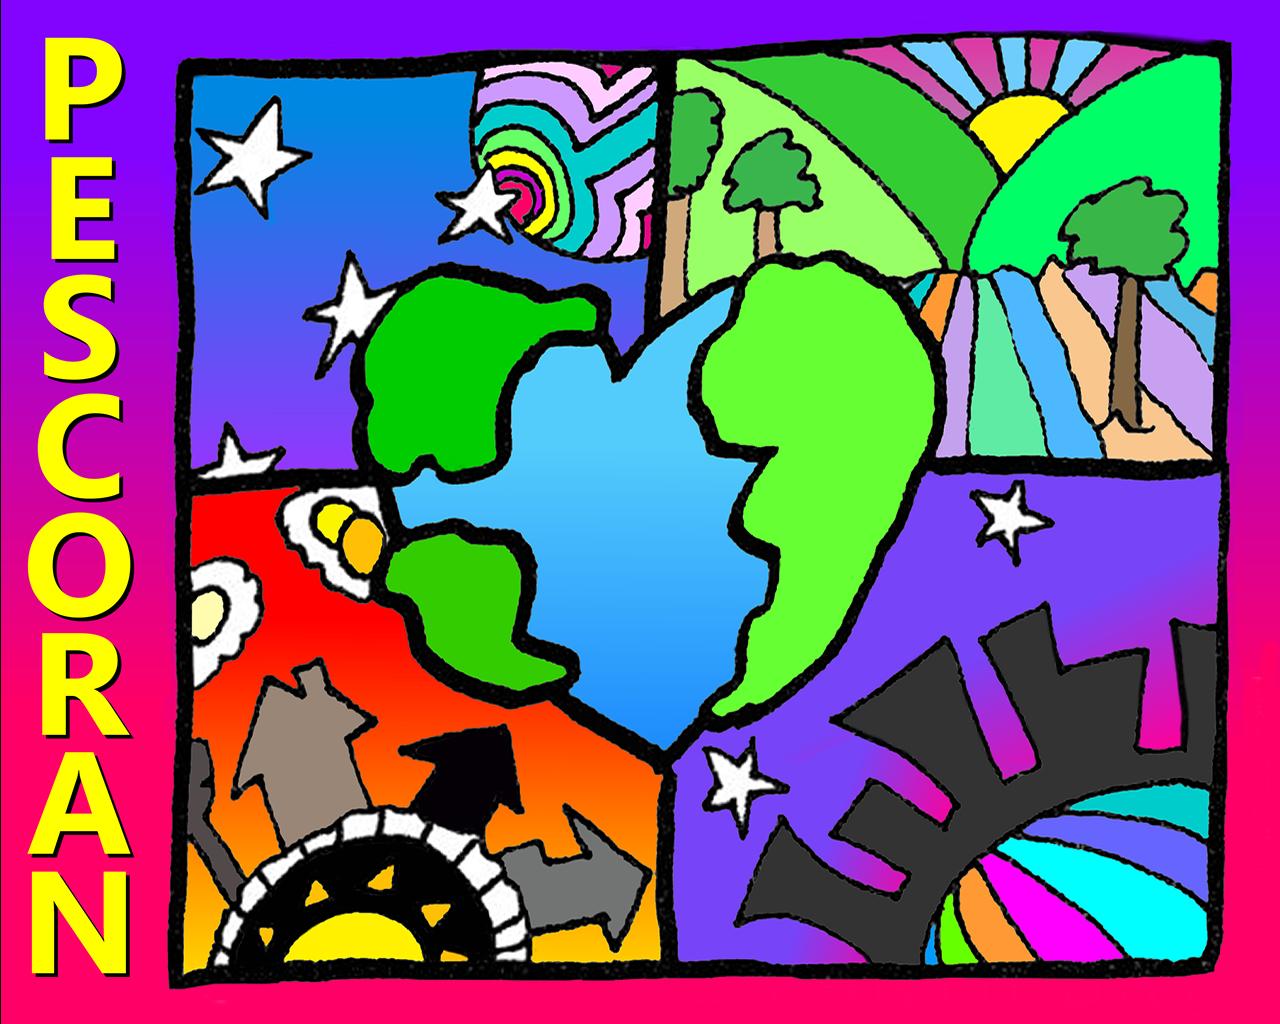 John Pescoran Pop Art 壁紙 Pop Art 壁紙 30513476 ファンポップ